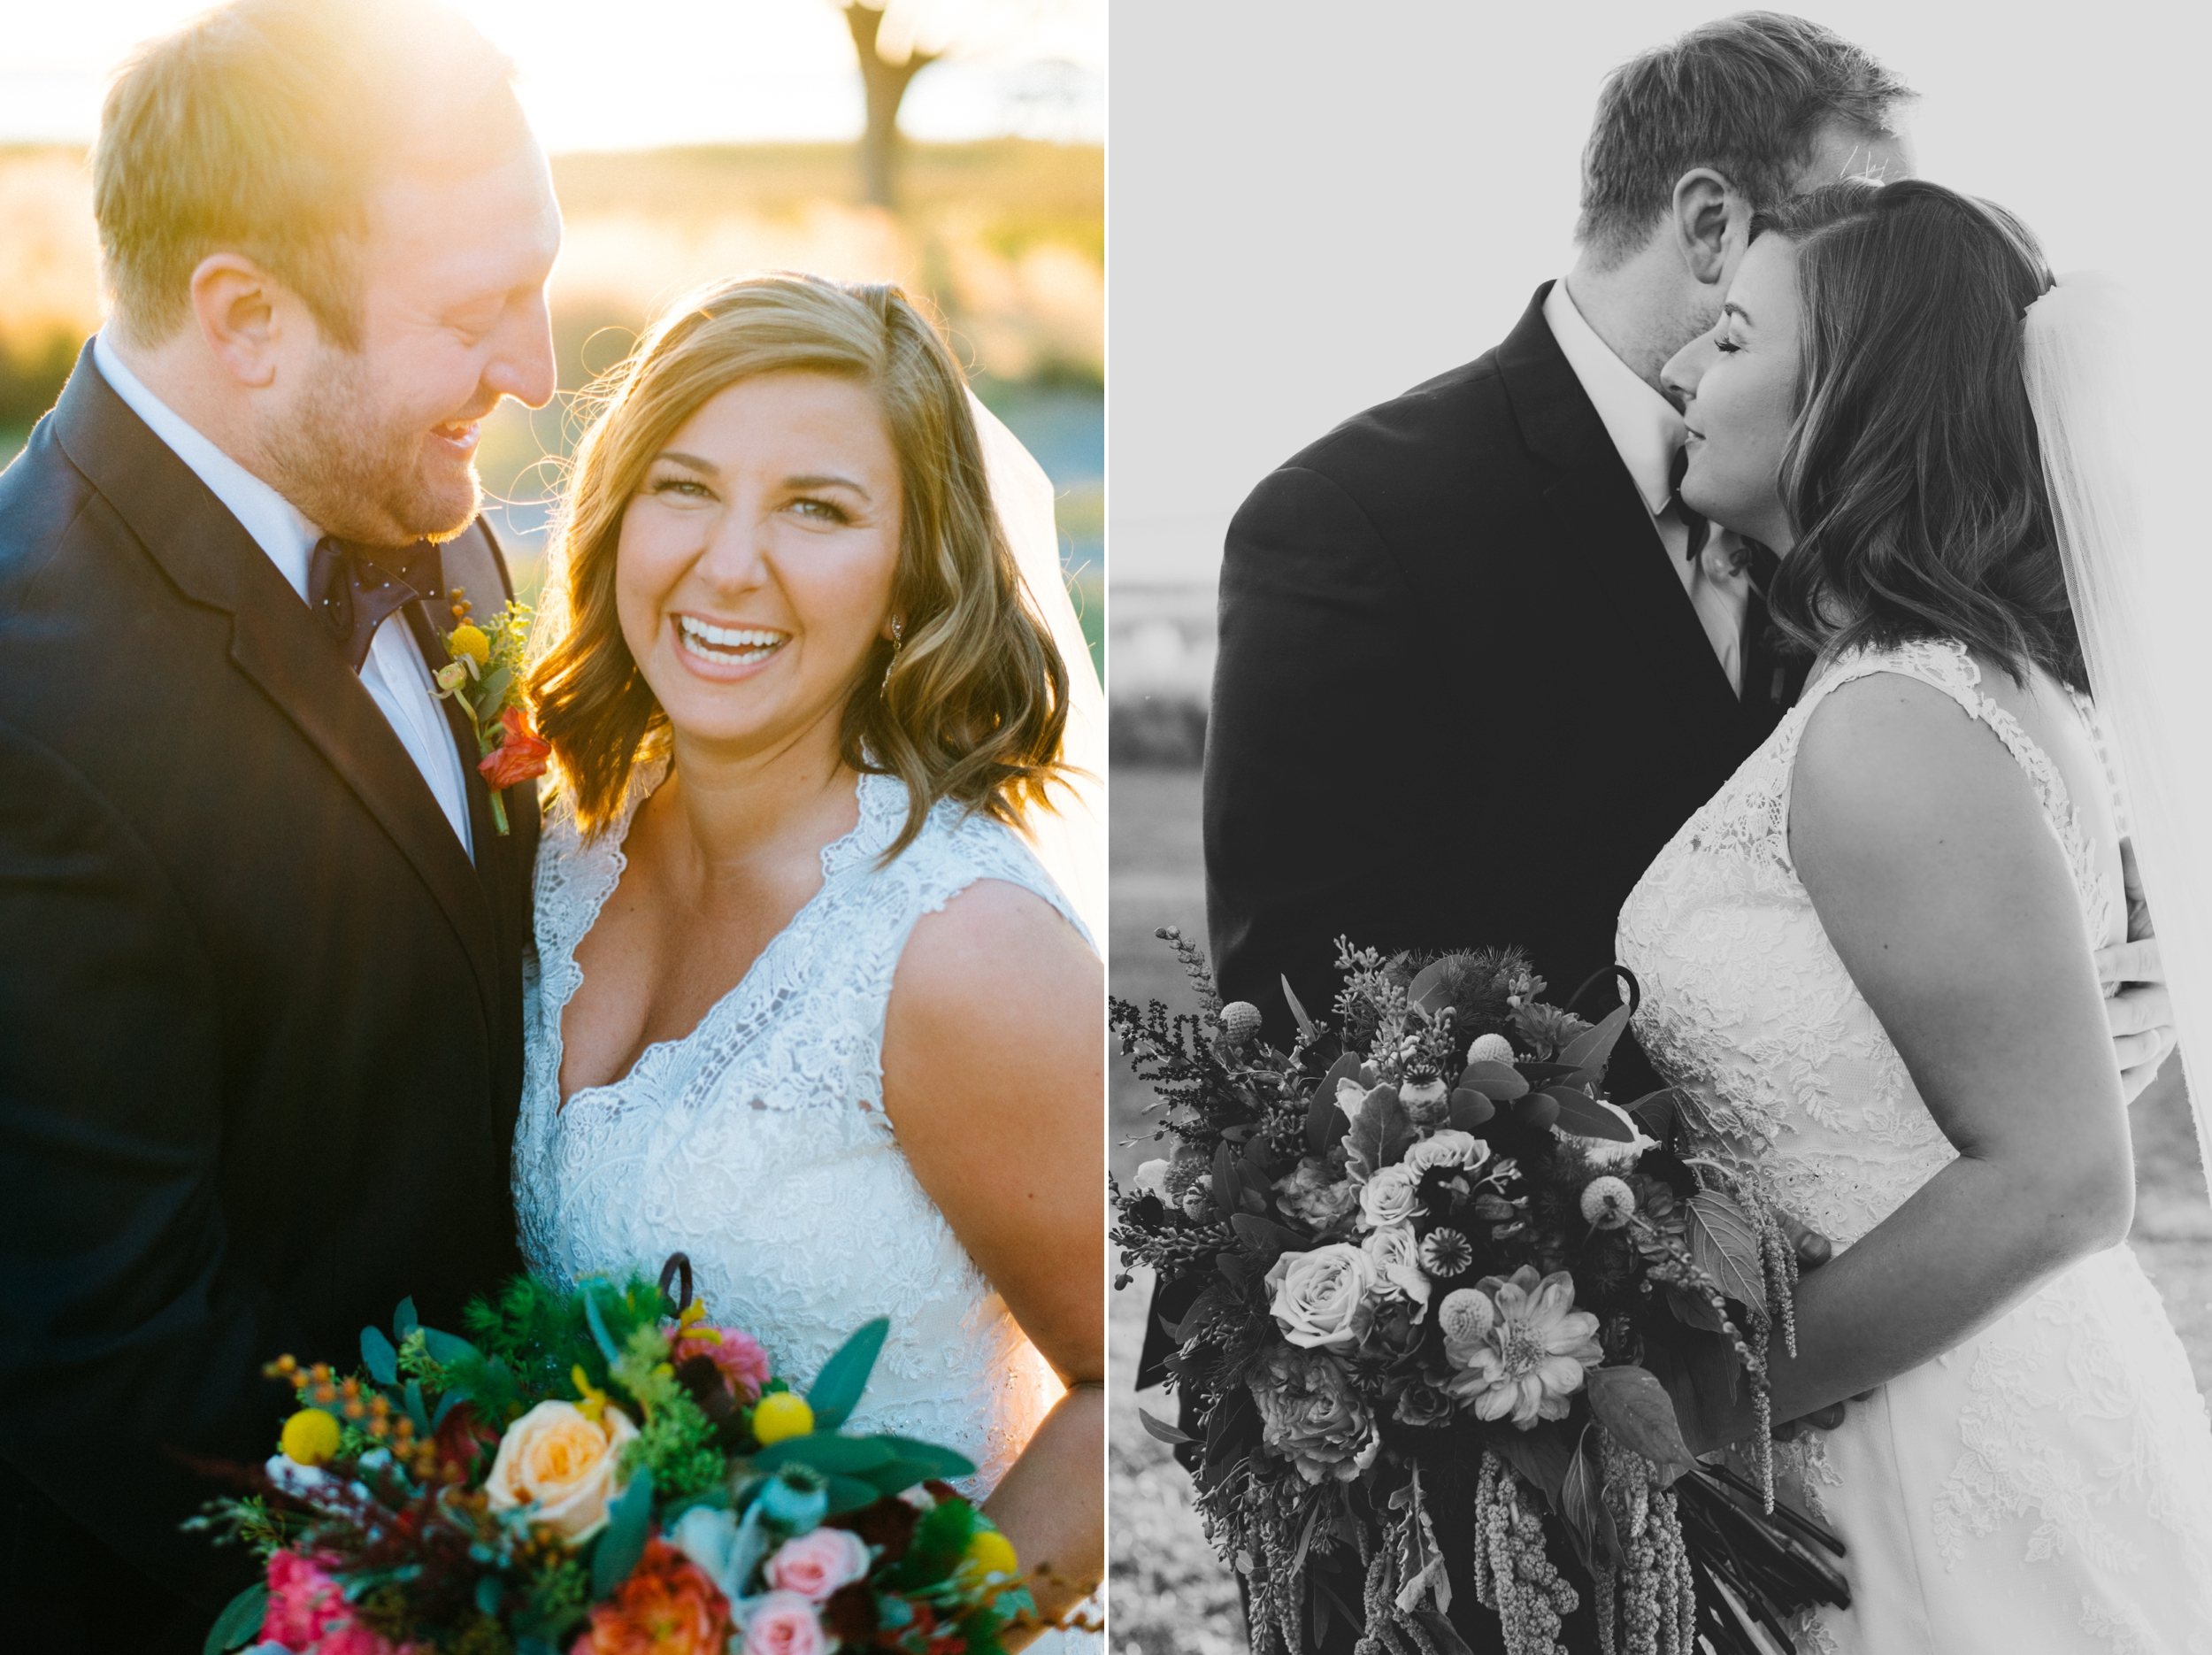 Charleston-wedding-photographer-85.jpg